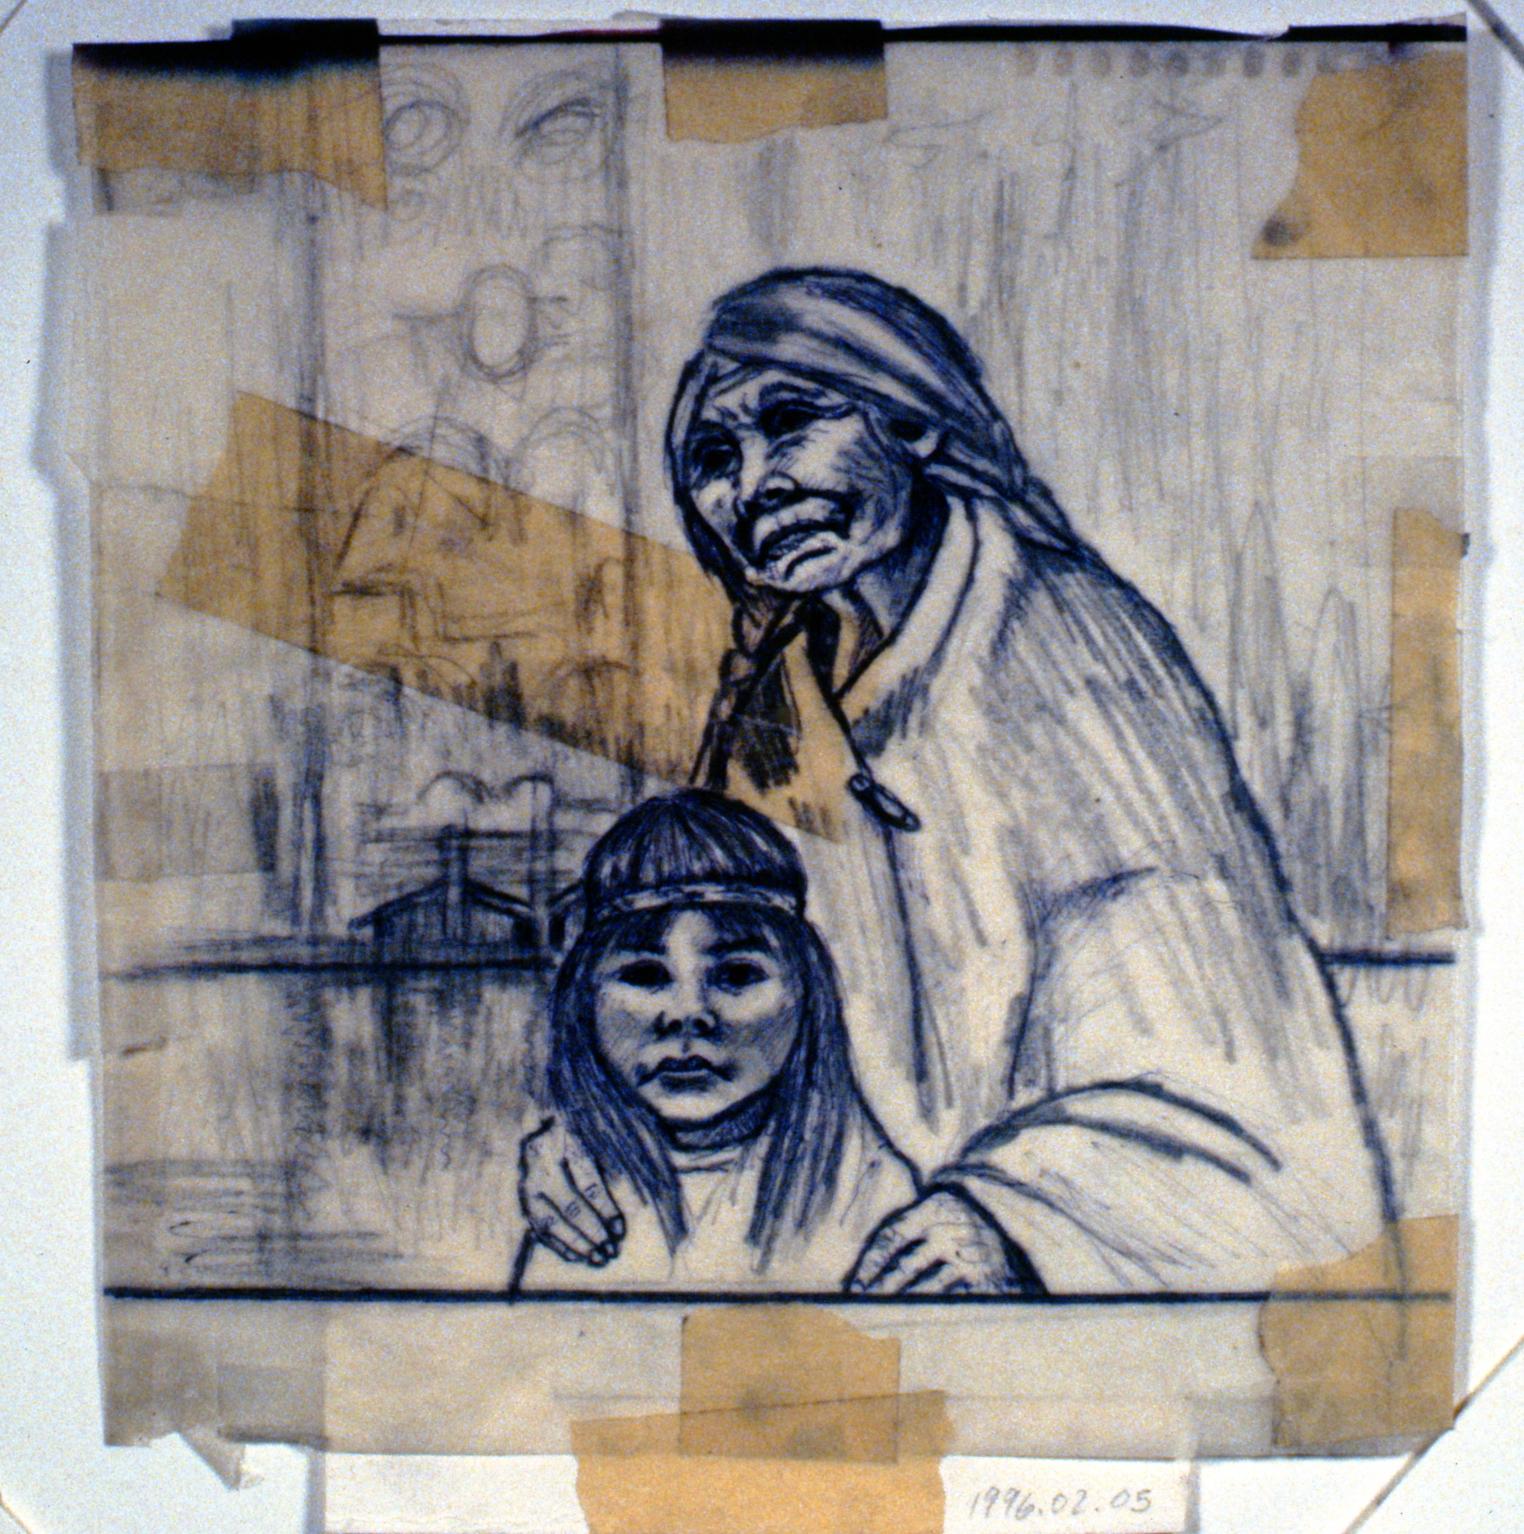 Ages Past (Grandmother) , n.d., Minn Sjølseth, sketch, 21 x 23cm, 1996.02.05